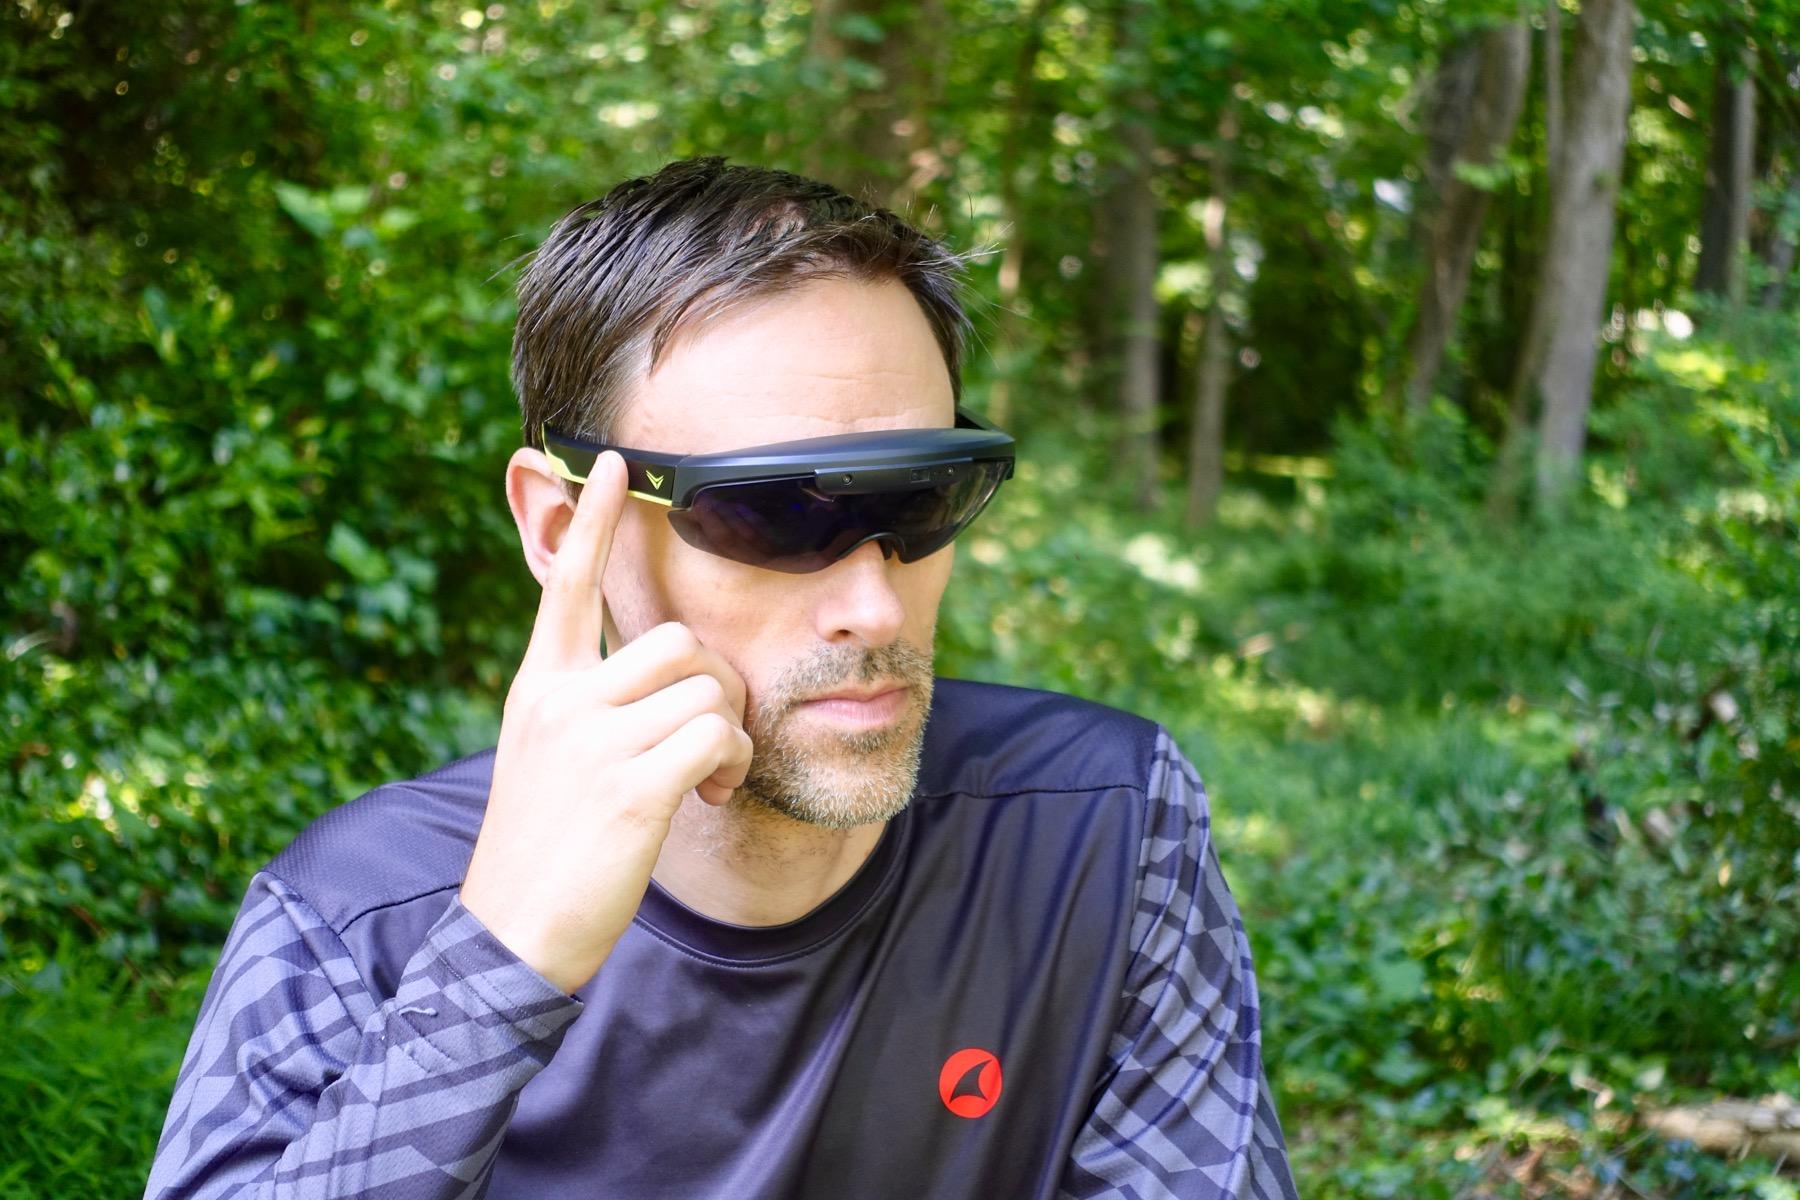 Tested: Everysight Raptor is a Heads-up Display for Mountain Biking with GPS, Brow Cam - Singletracks Mountain Bike News